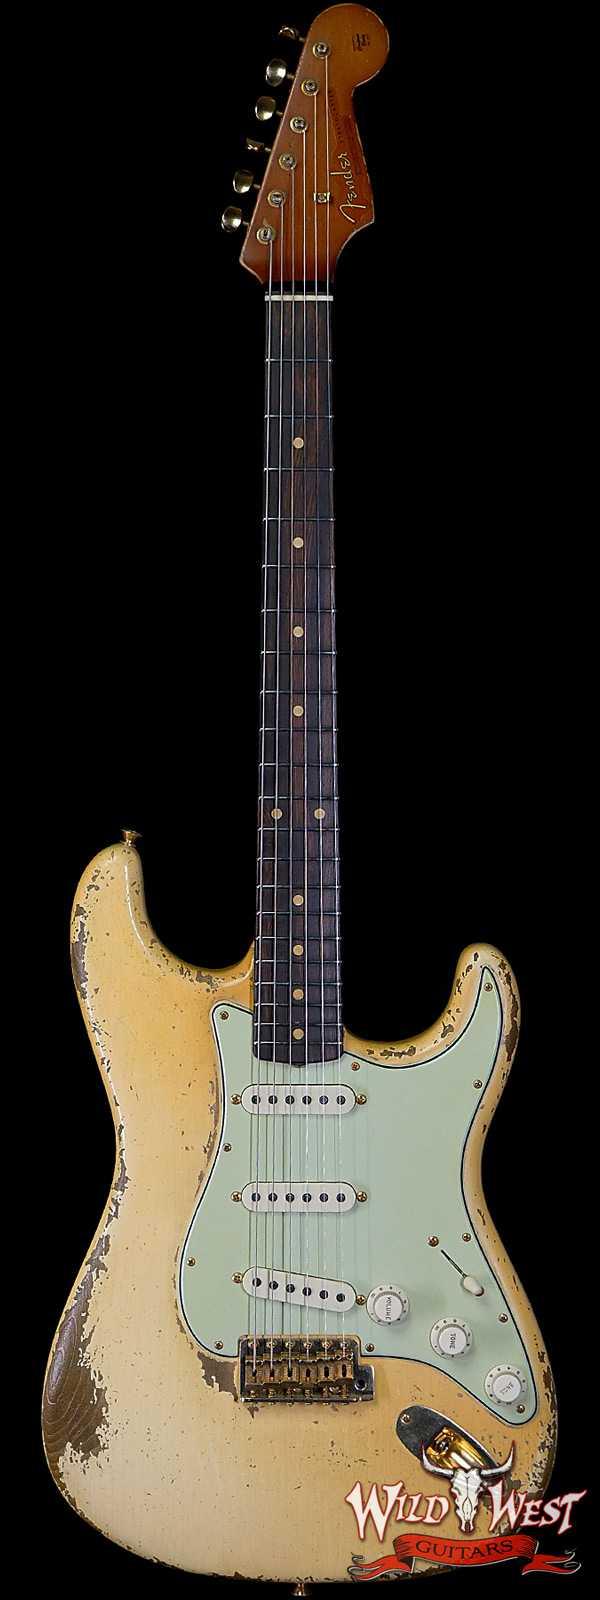 Fender Custom Shop Dale Wilson Masterbuilt 1963 Stratocaster Heavy Relic Brazilian Rosewood Fingerboard Vintage White